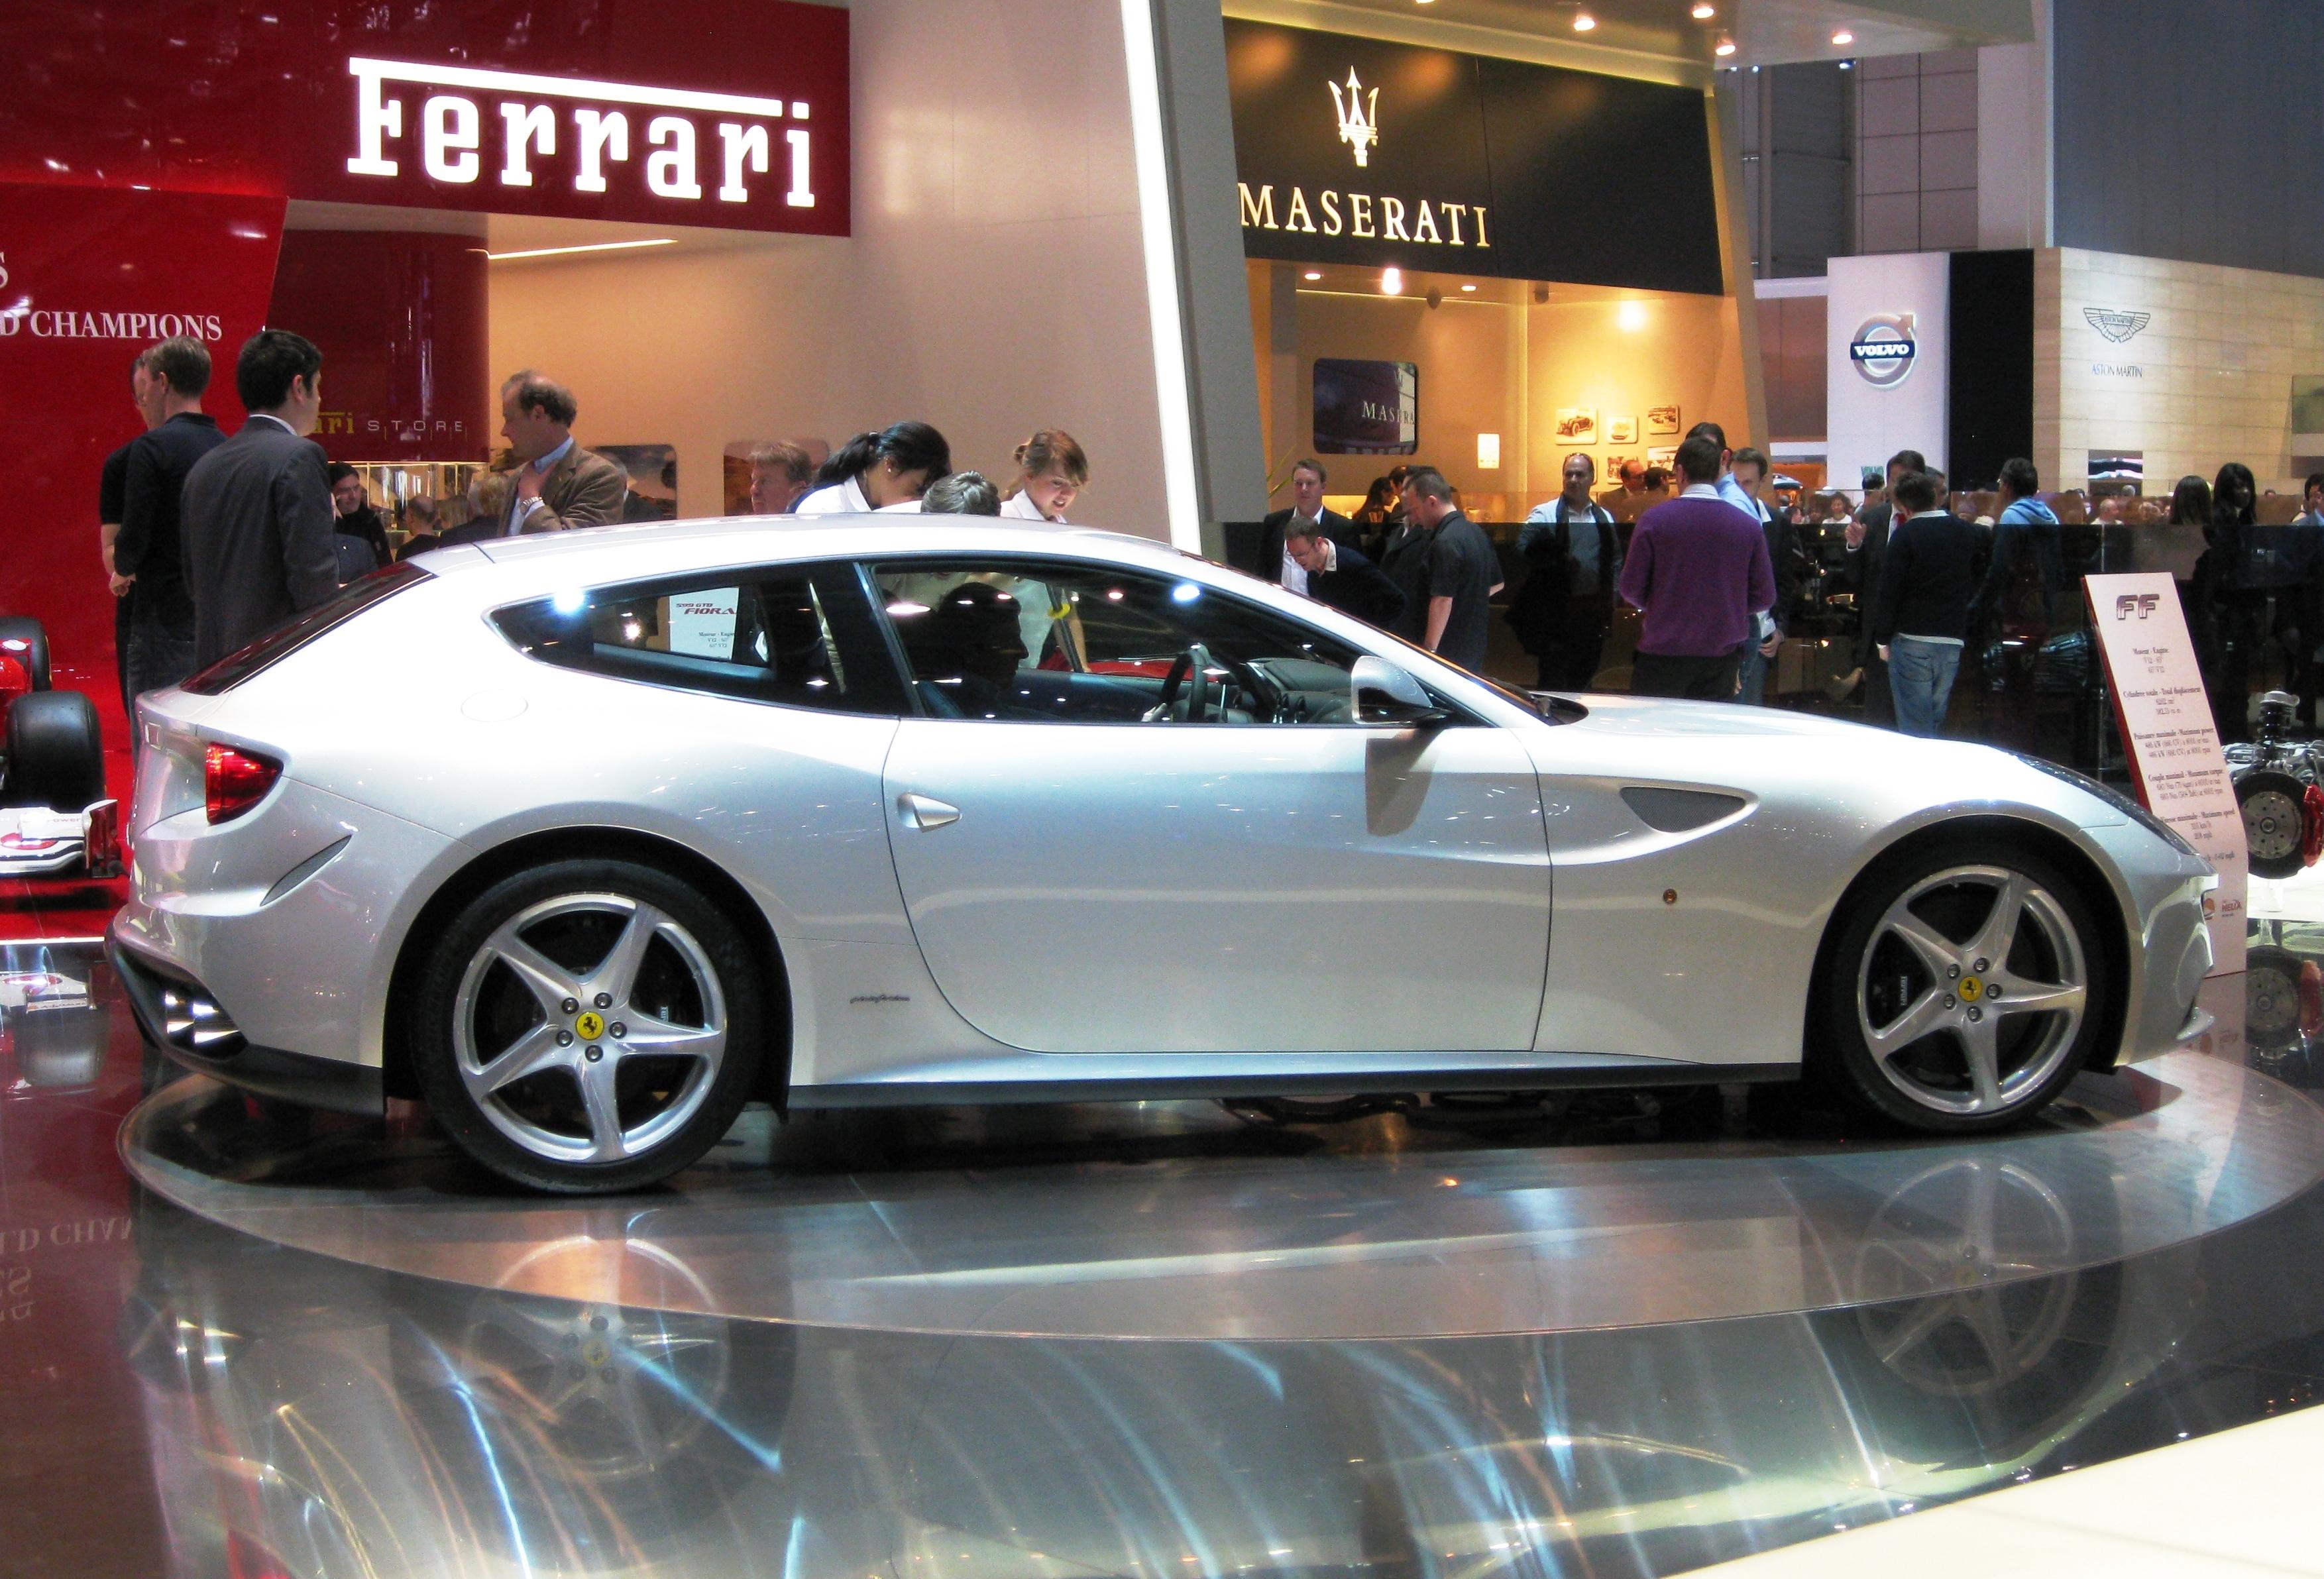 2011-03-04_Autosalon_Genf_1369 Breathtaking Ferrari Mondial T Cabrio Kaufen Cars Trend